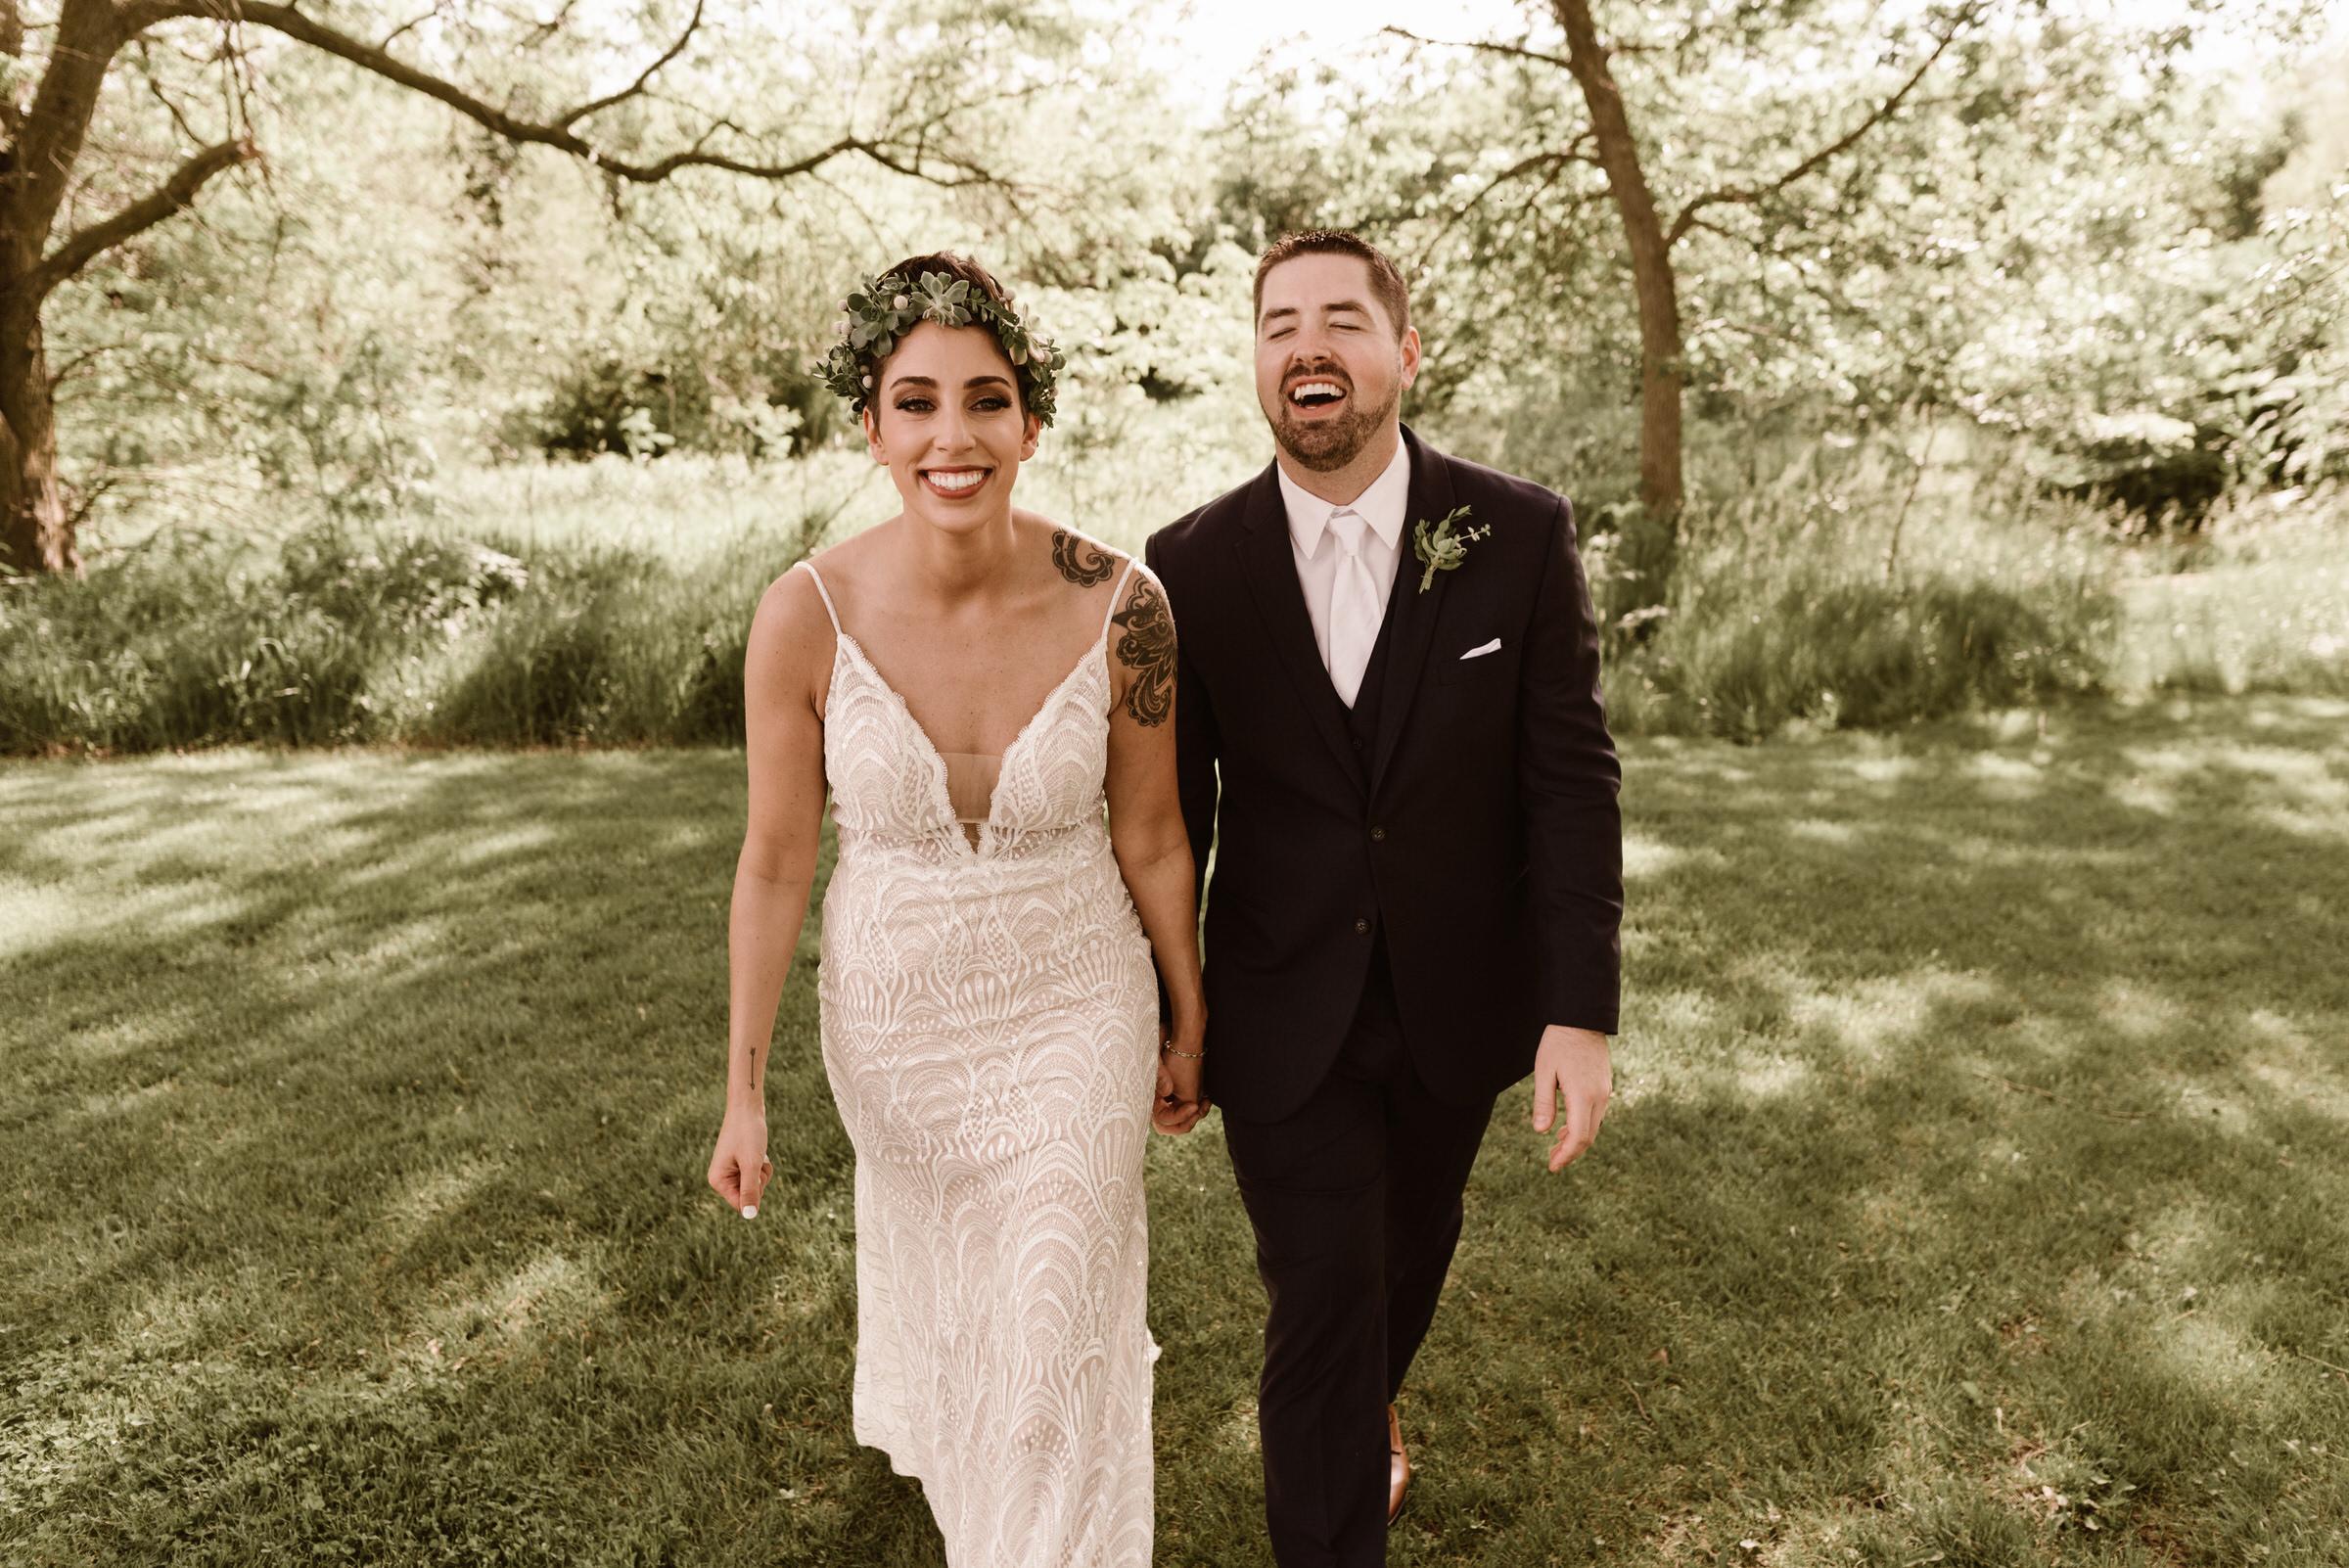 Wilderness-Ridge-Lincoln-Nebraska-Wedding-Kaylie-Sirek-Photography-077.jpg